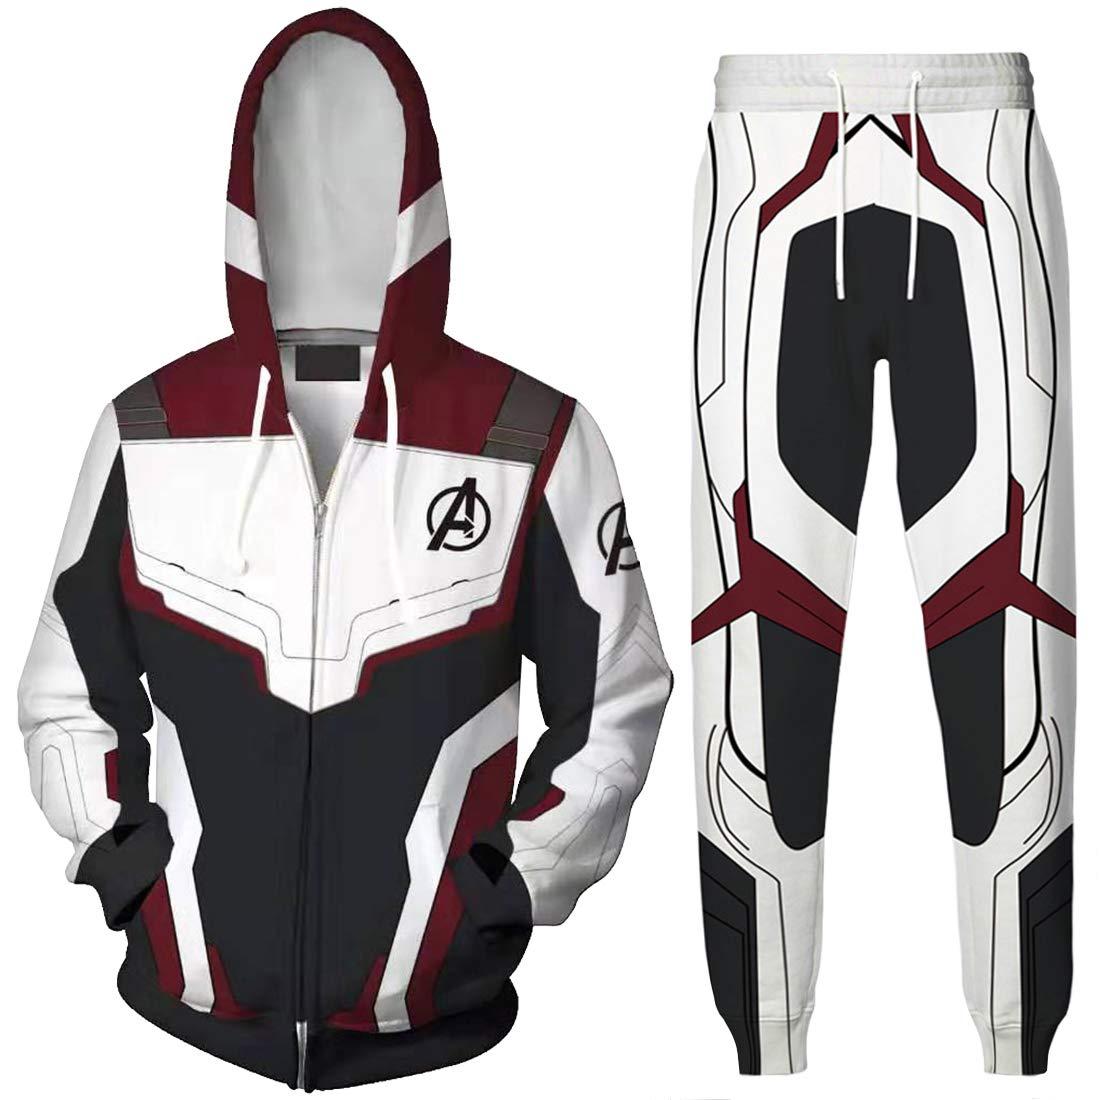 Amazon.com: EMILYLE Boy Avengers Hoodie Endgame Suits ...